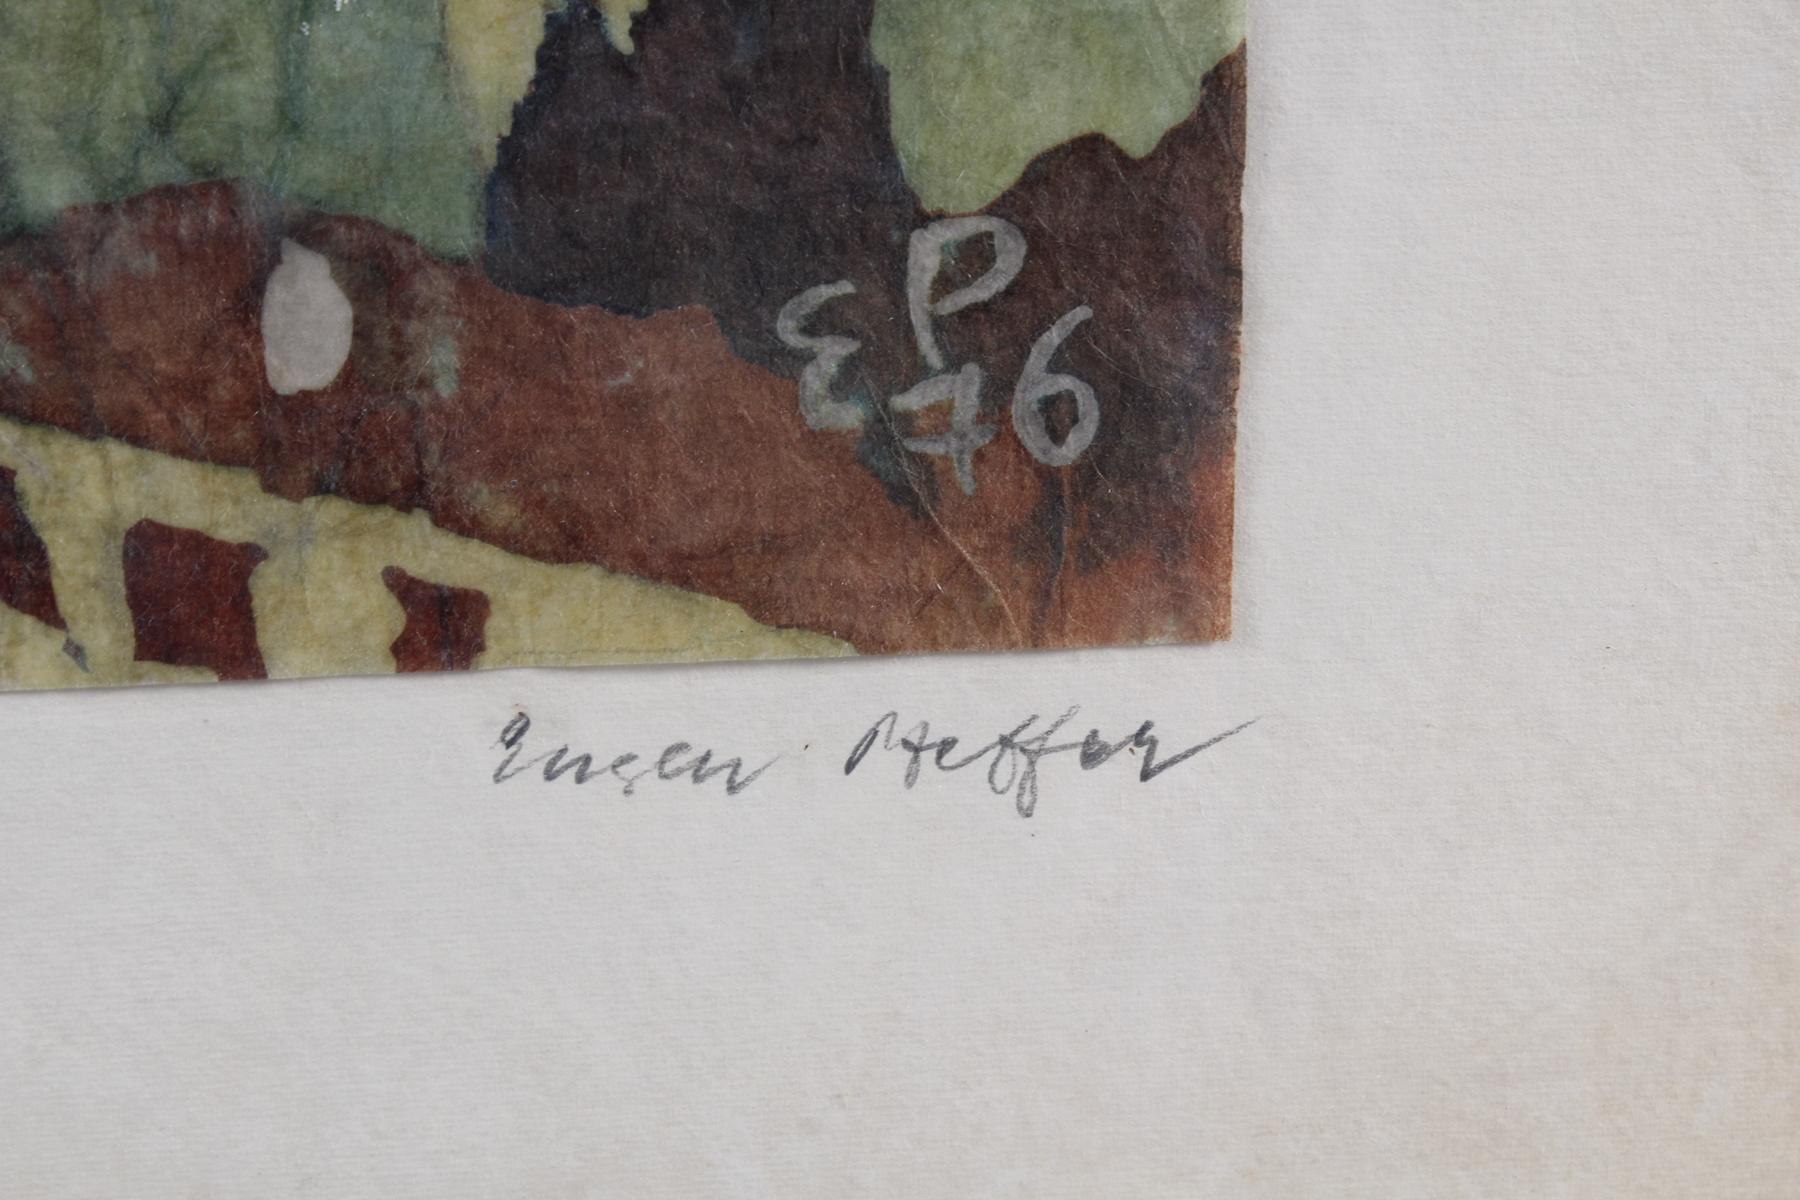 Eugen Pfeffer, St. Tropez, 1962-4